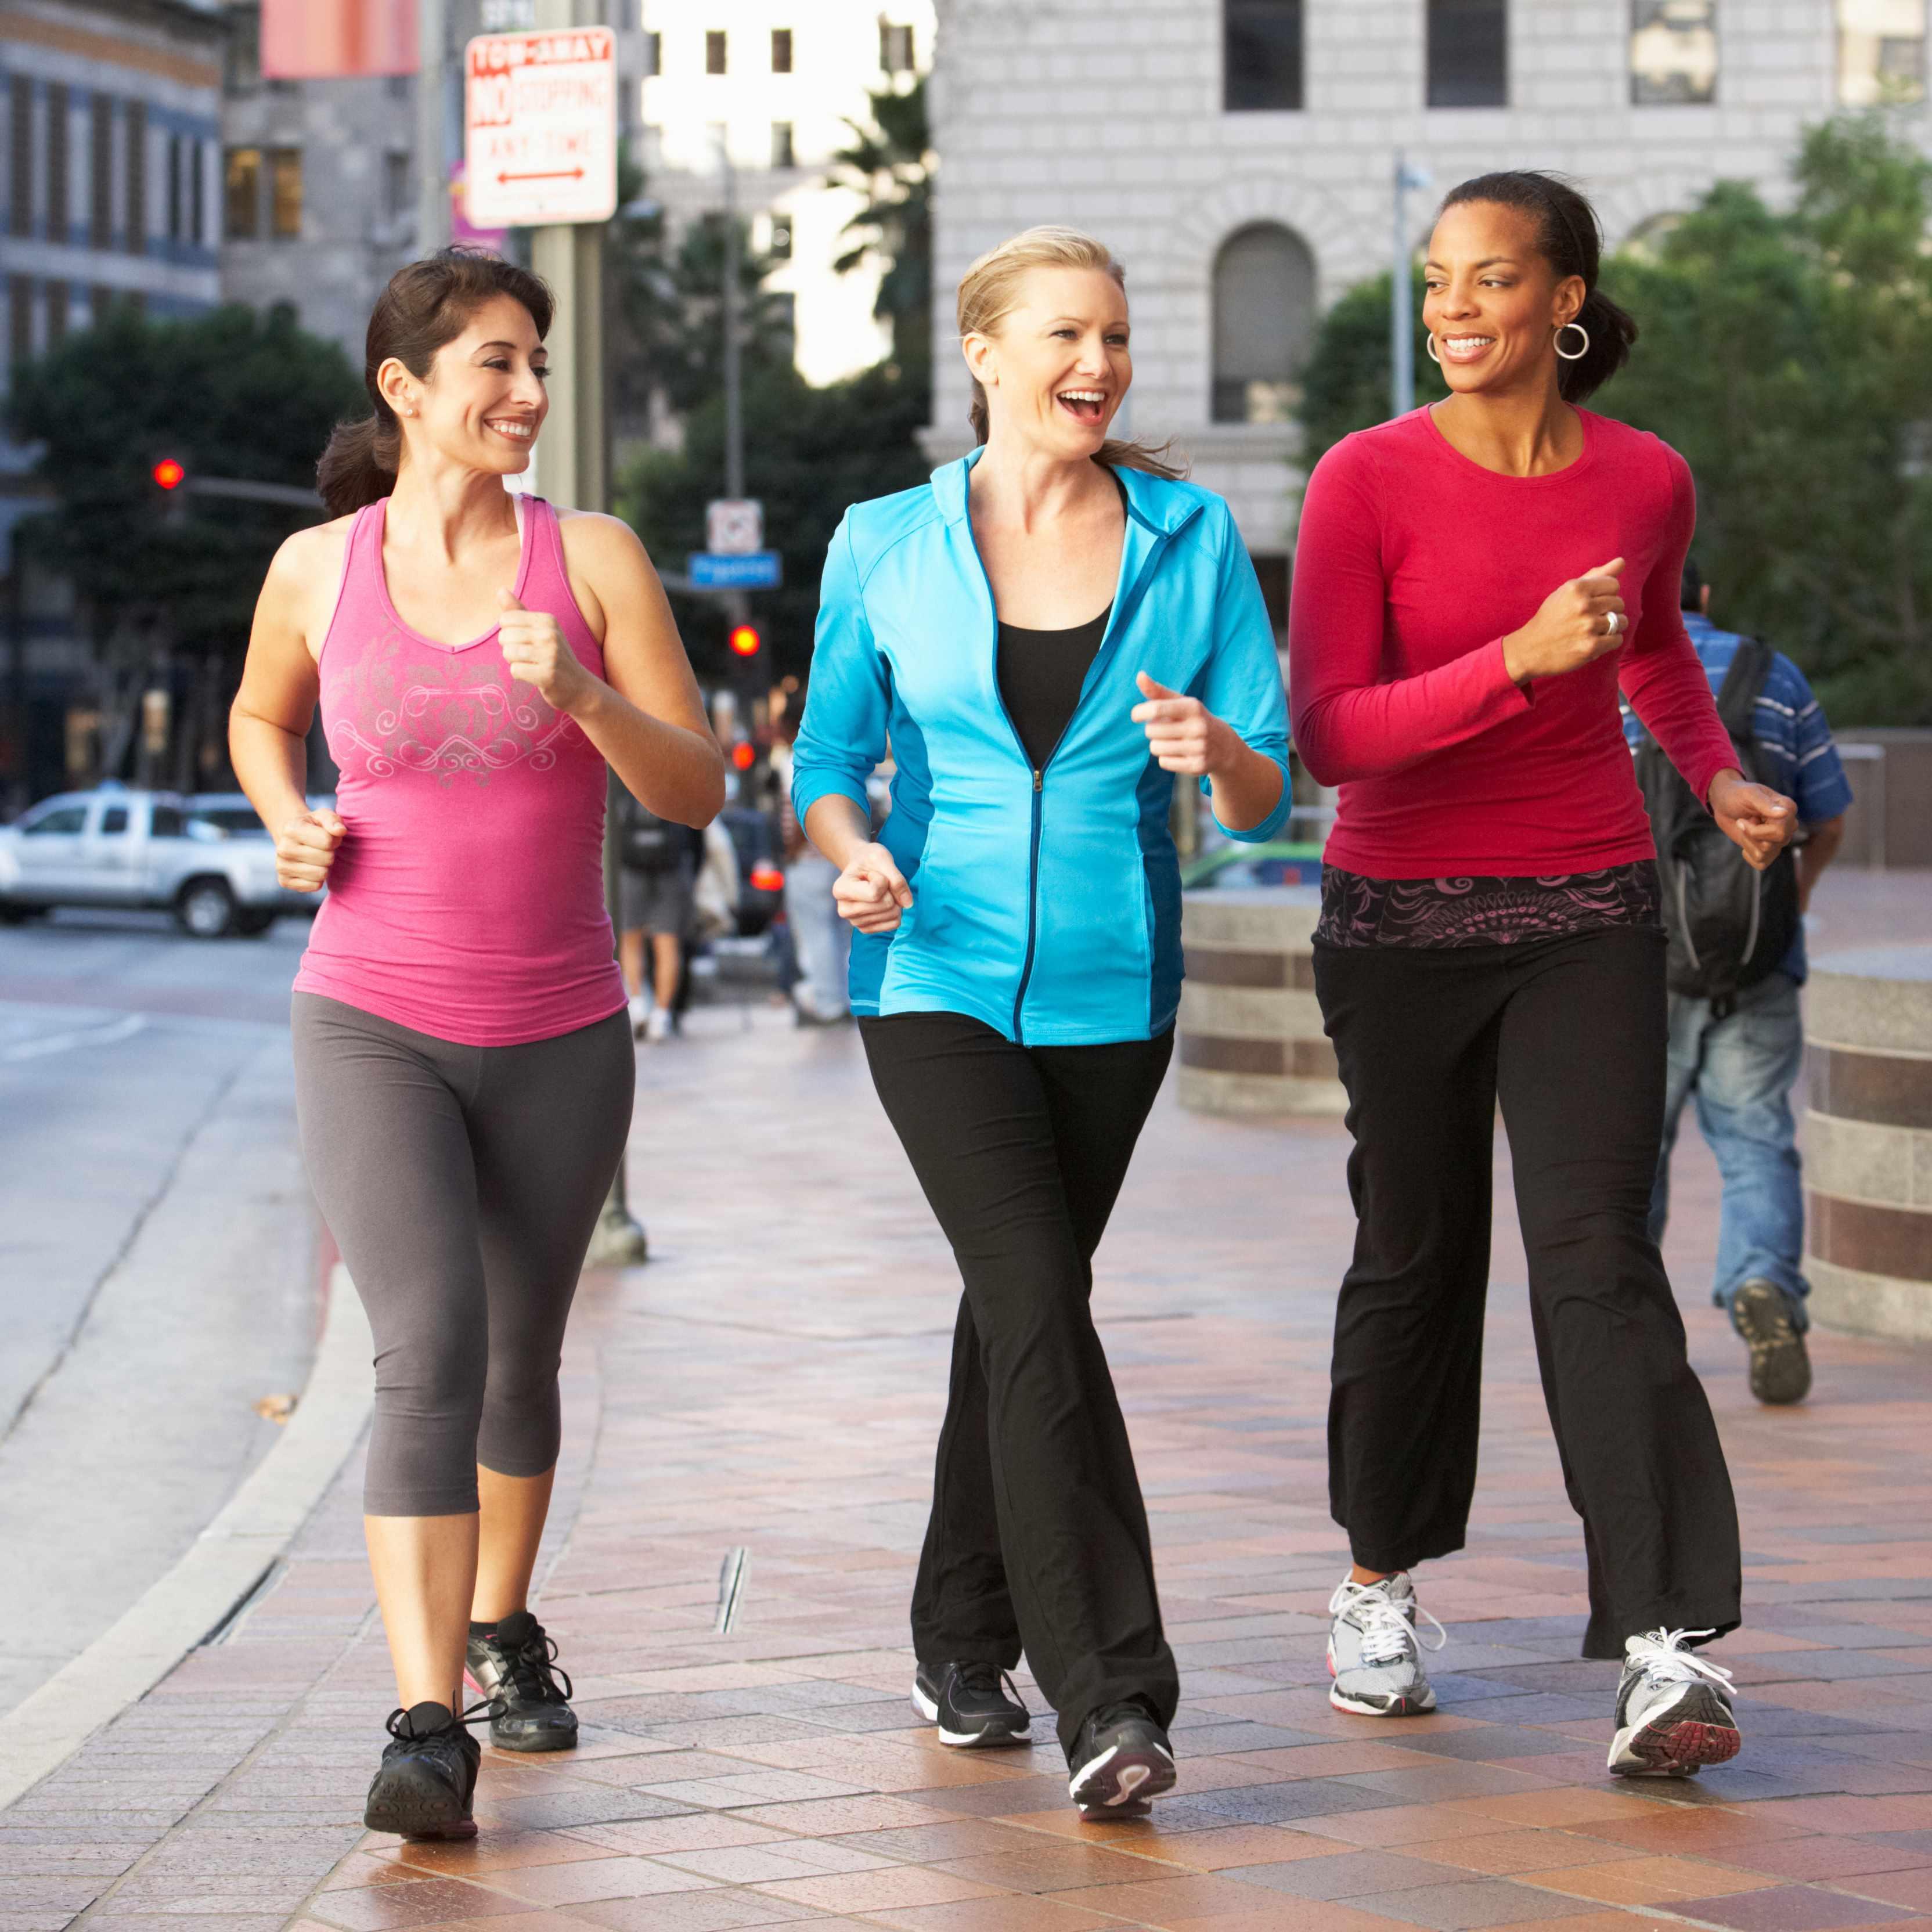 three smiling young women walking vigorously along a city sidewalk